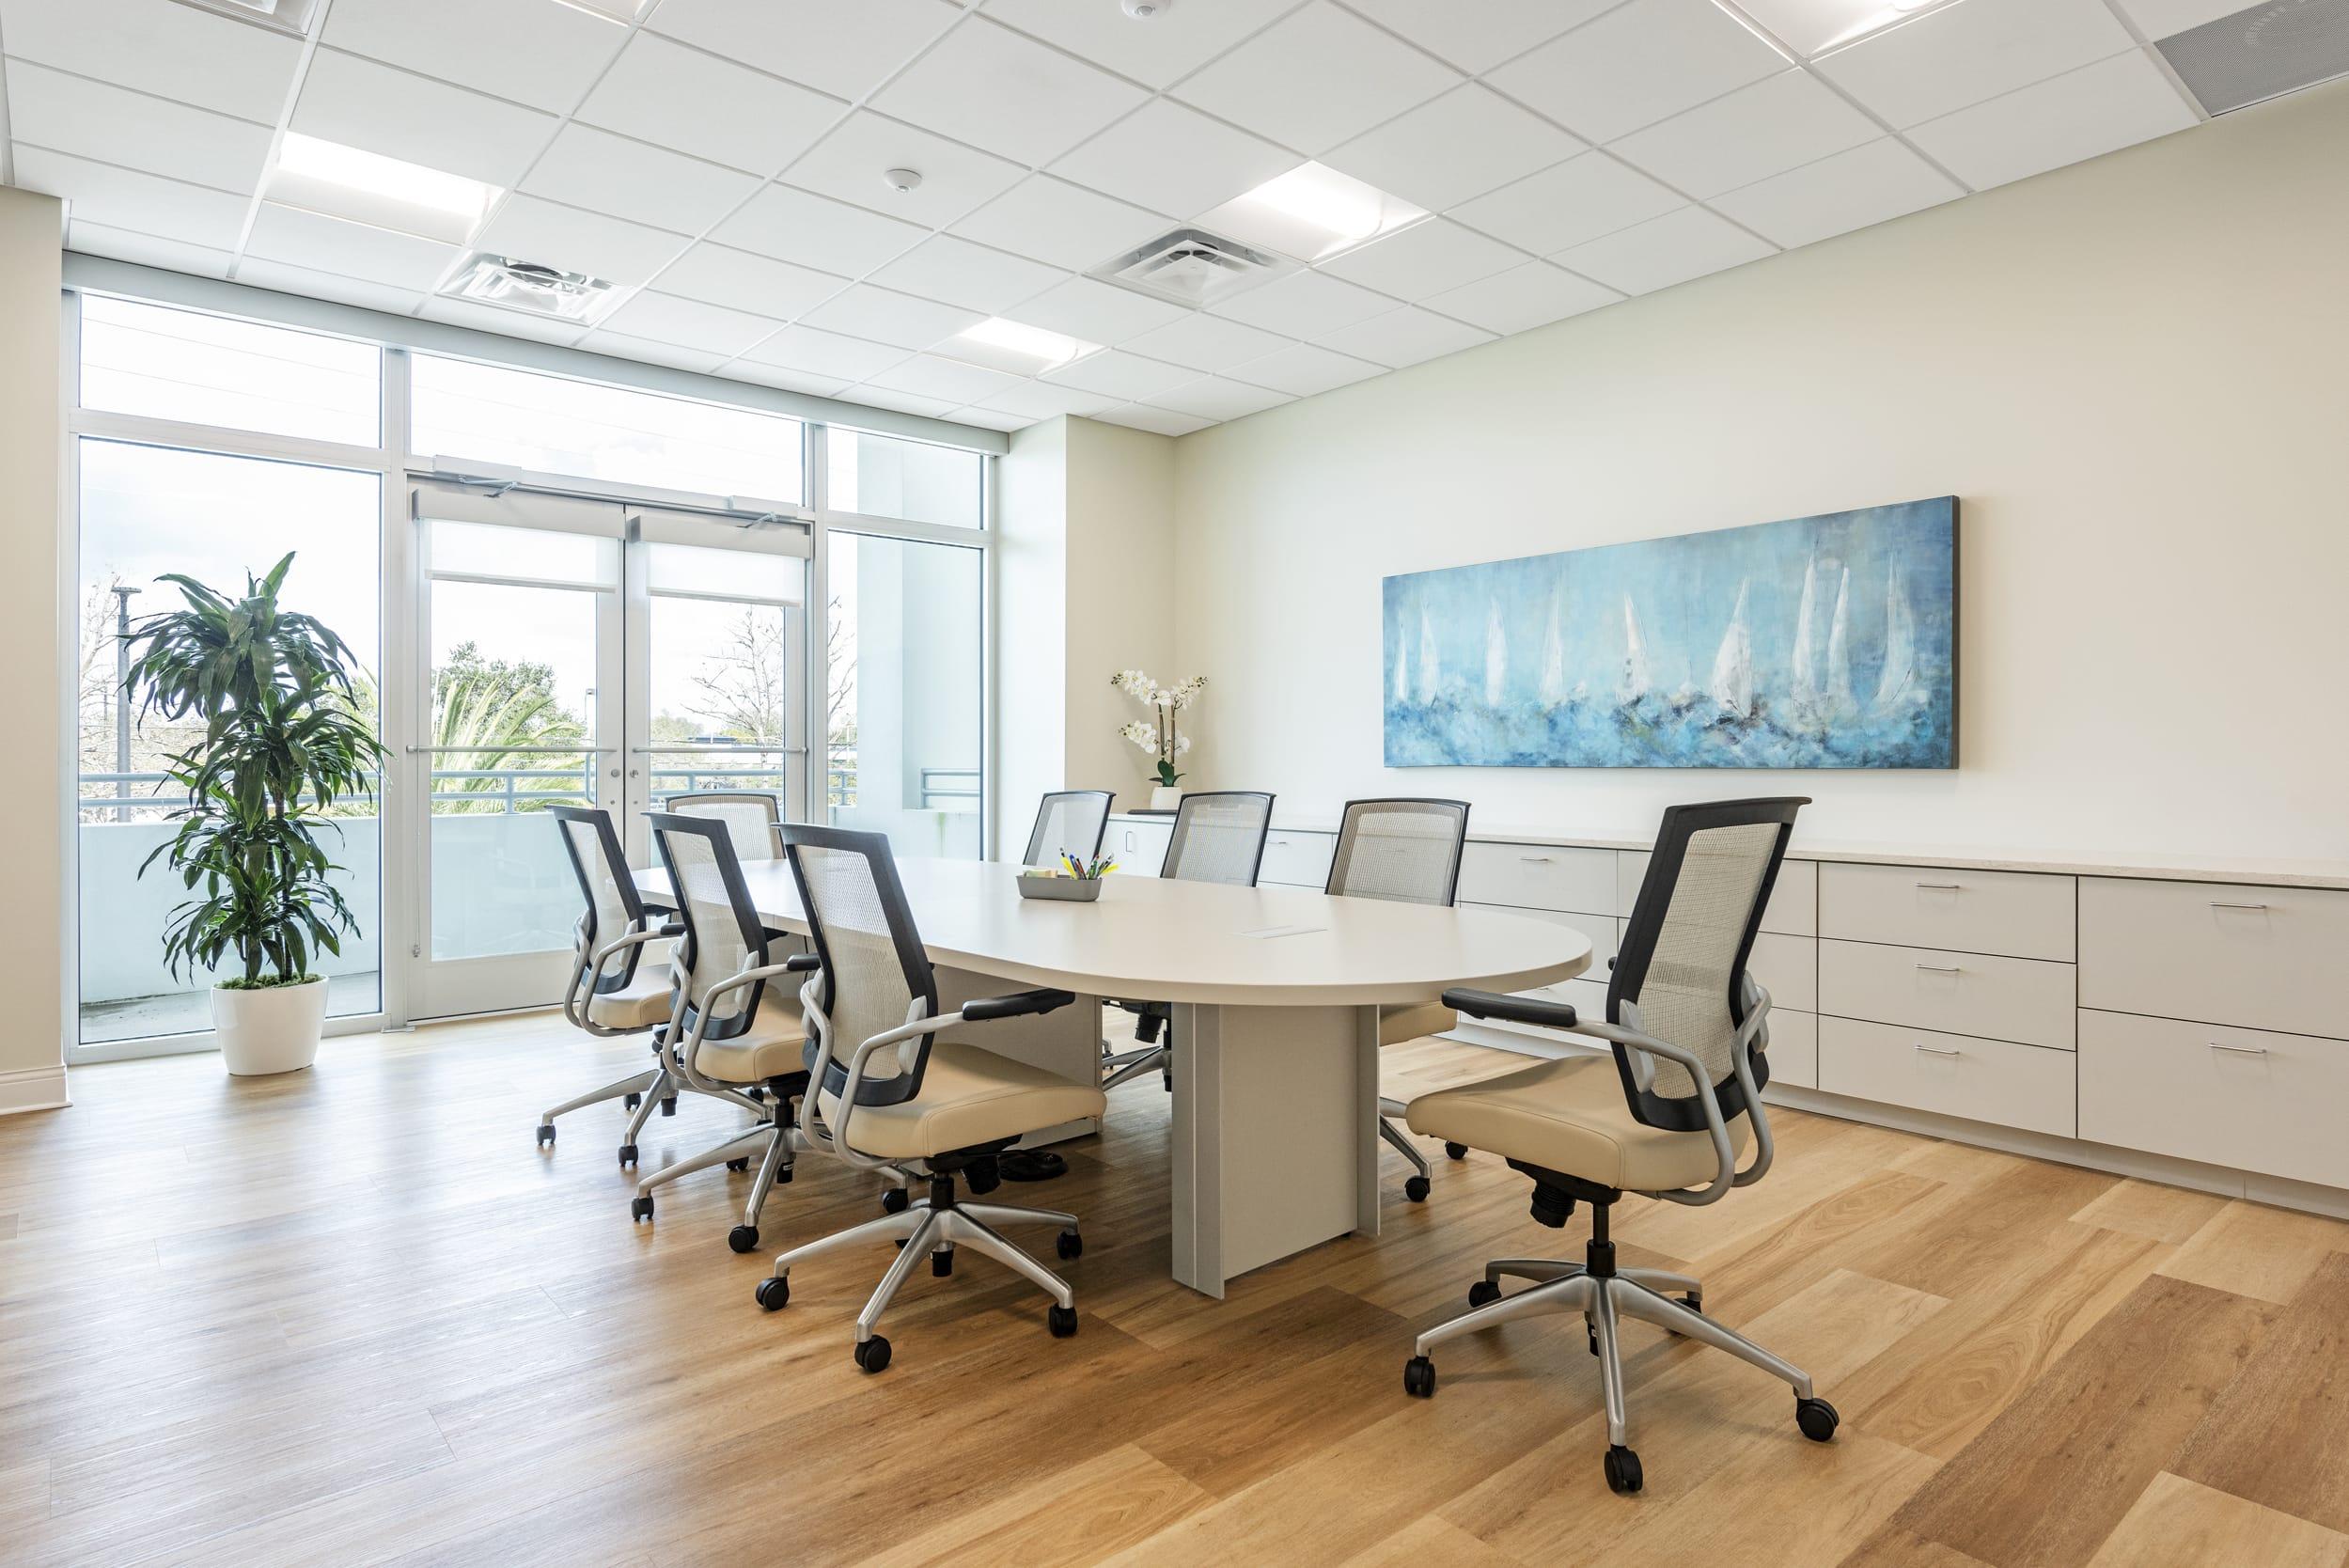 Exsecutive Meeting Conference Room Panoramic Sail Boats Painting